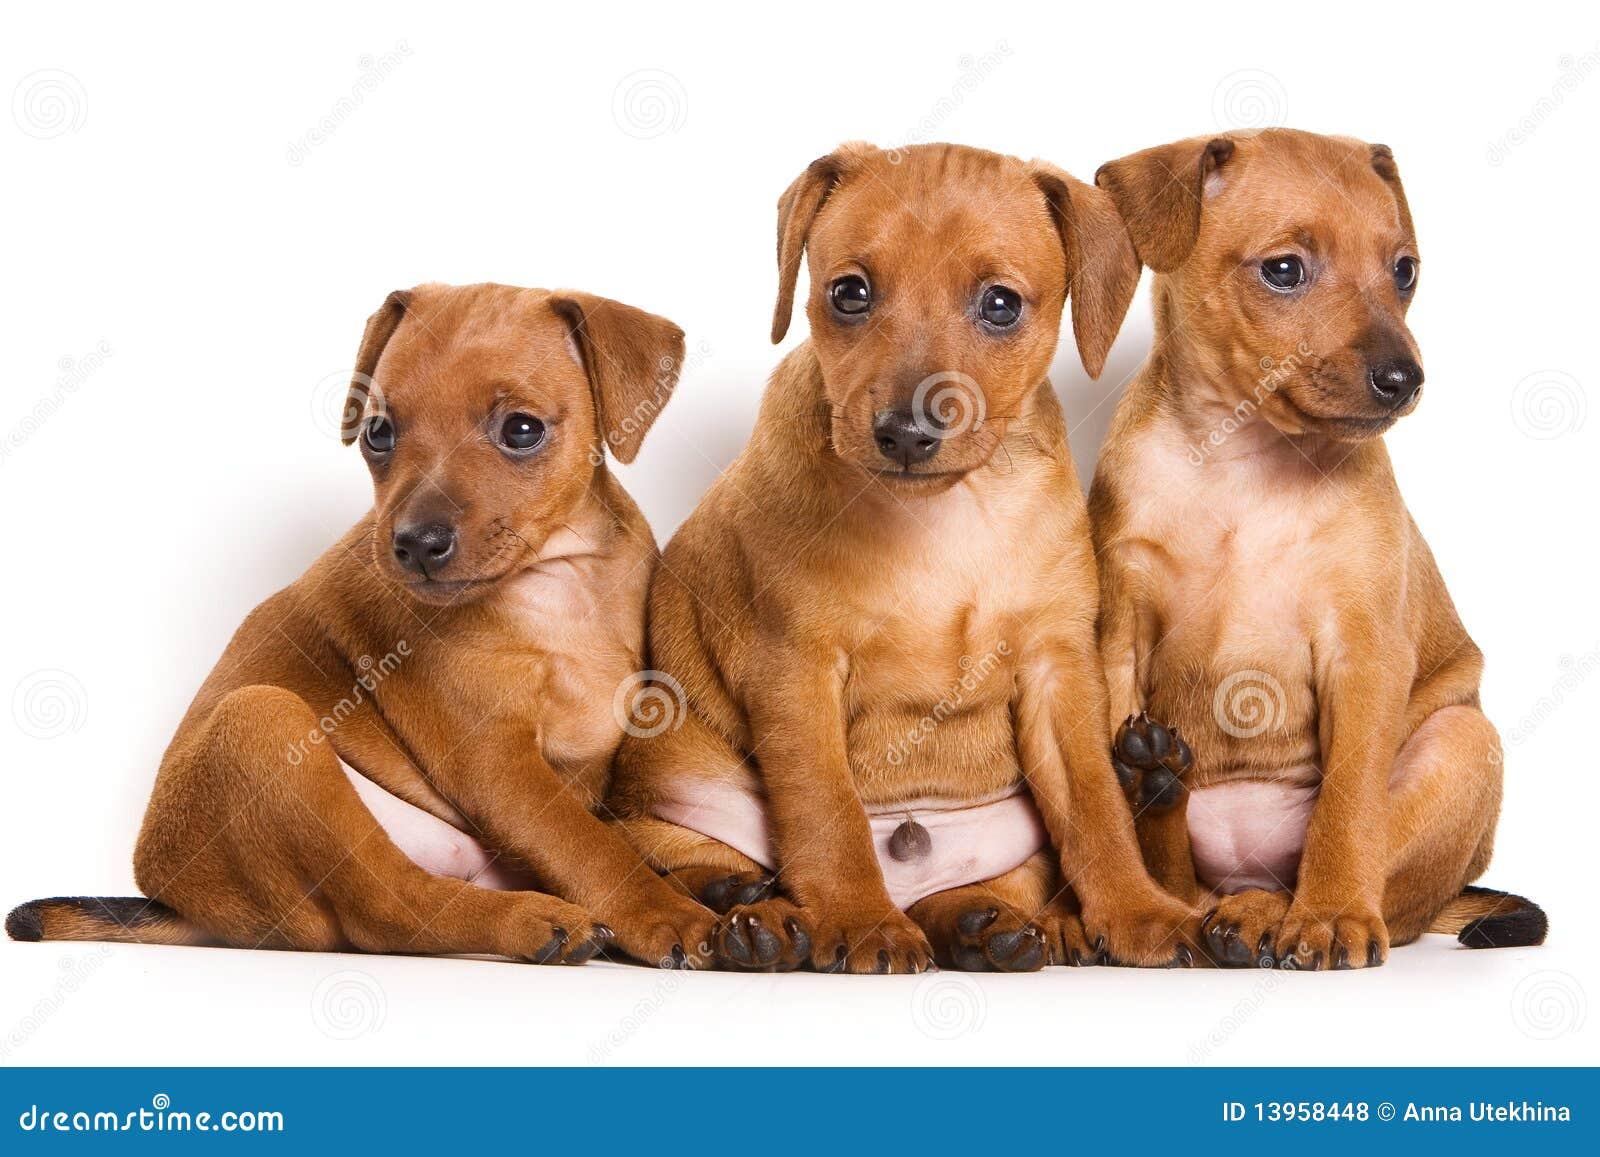 White Mini Pinscher | Dog Breeds Picture